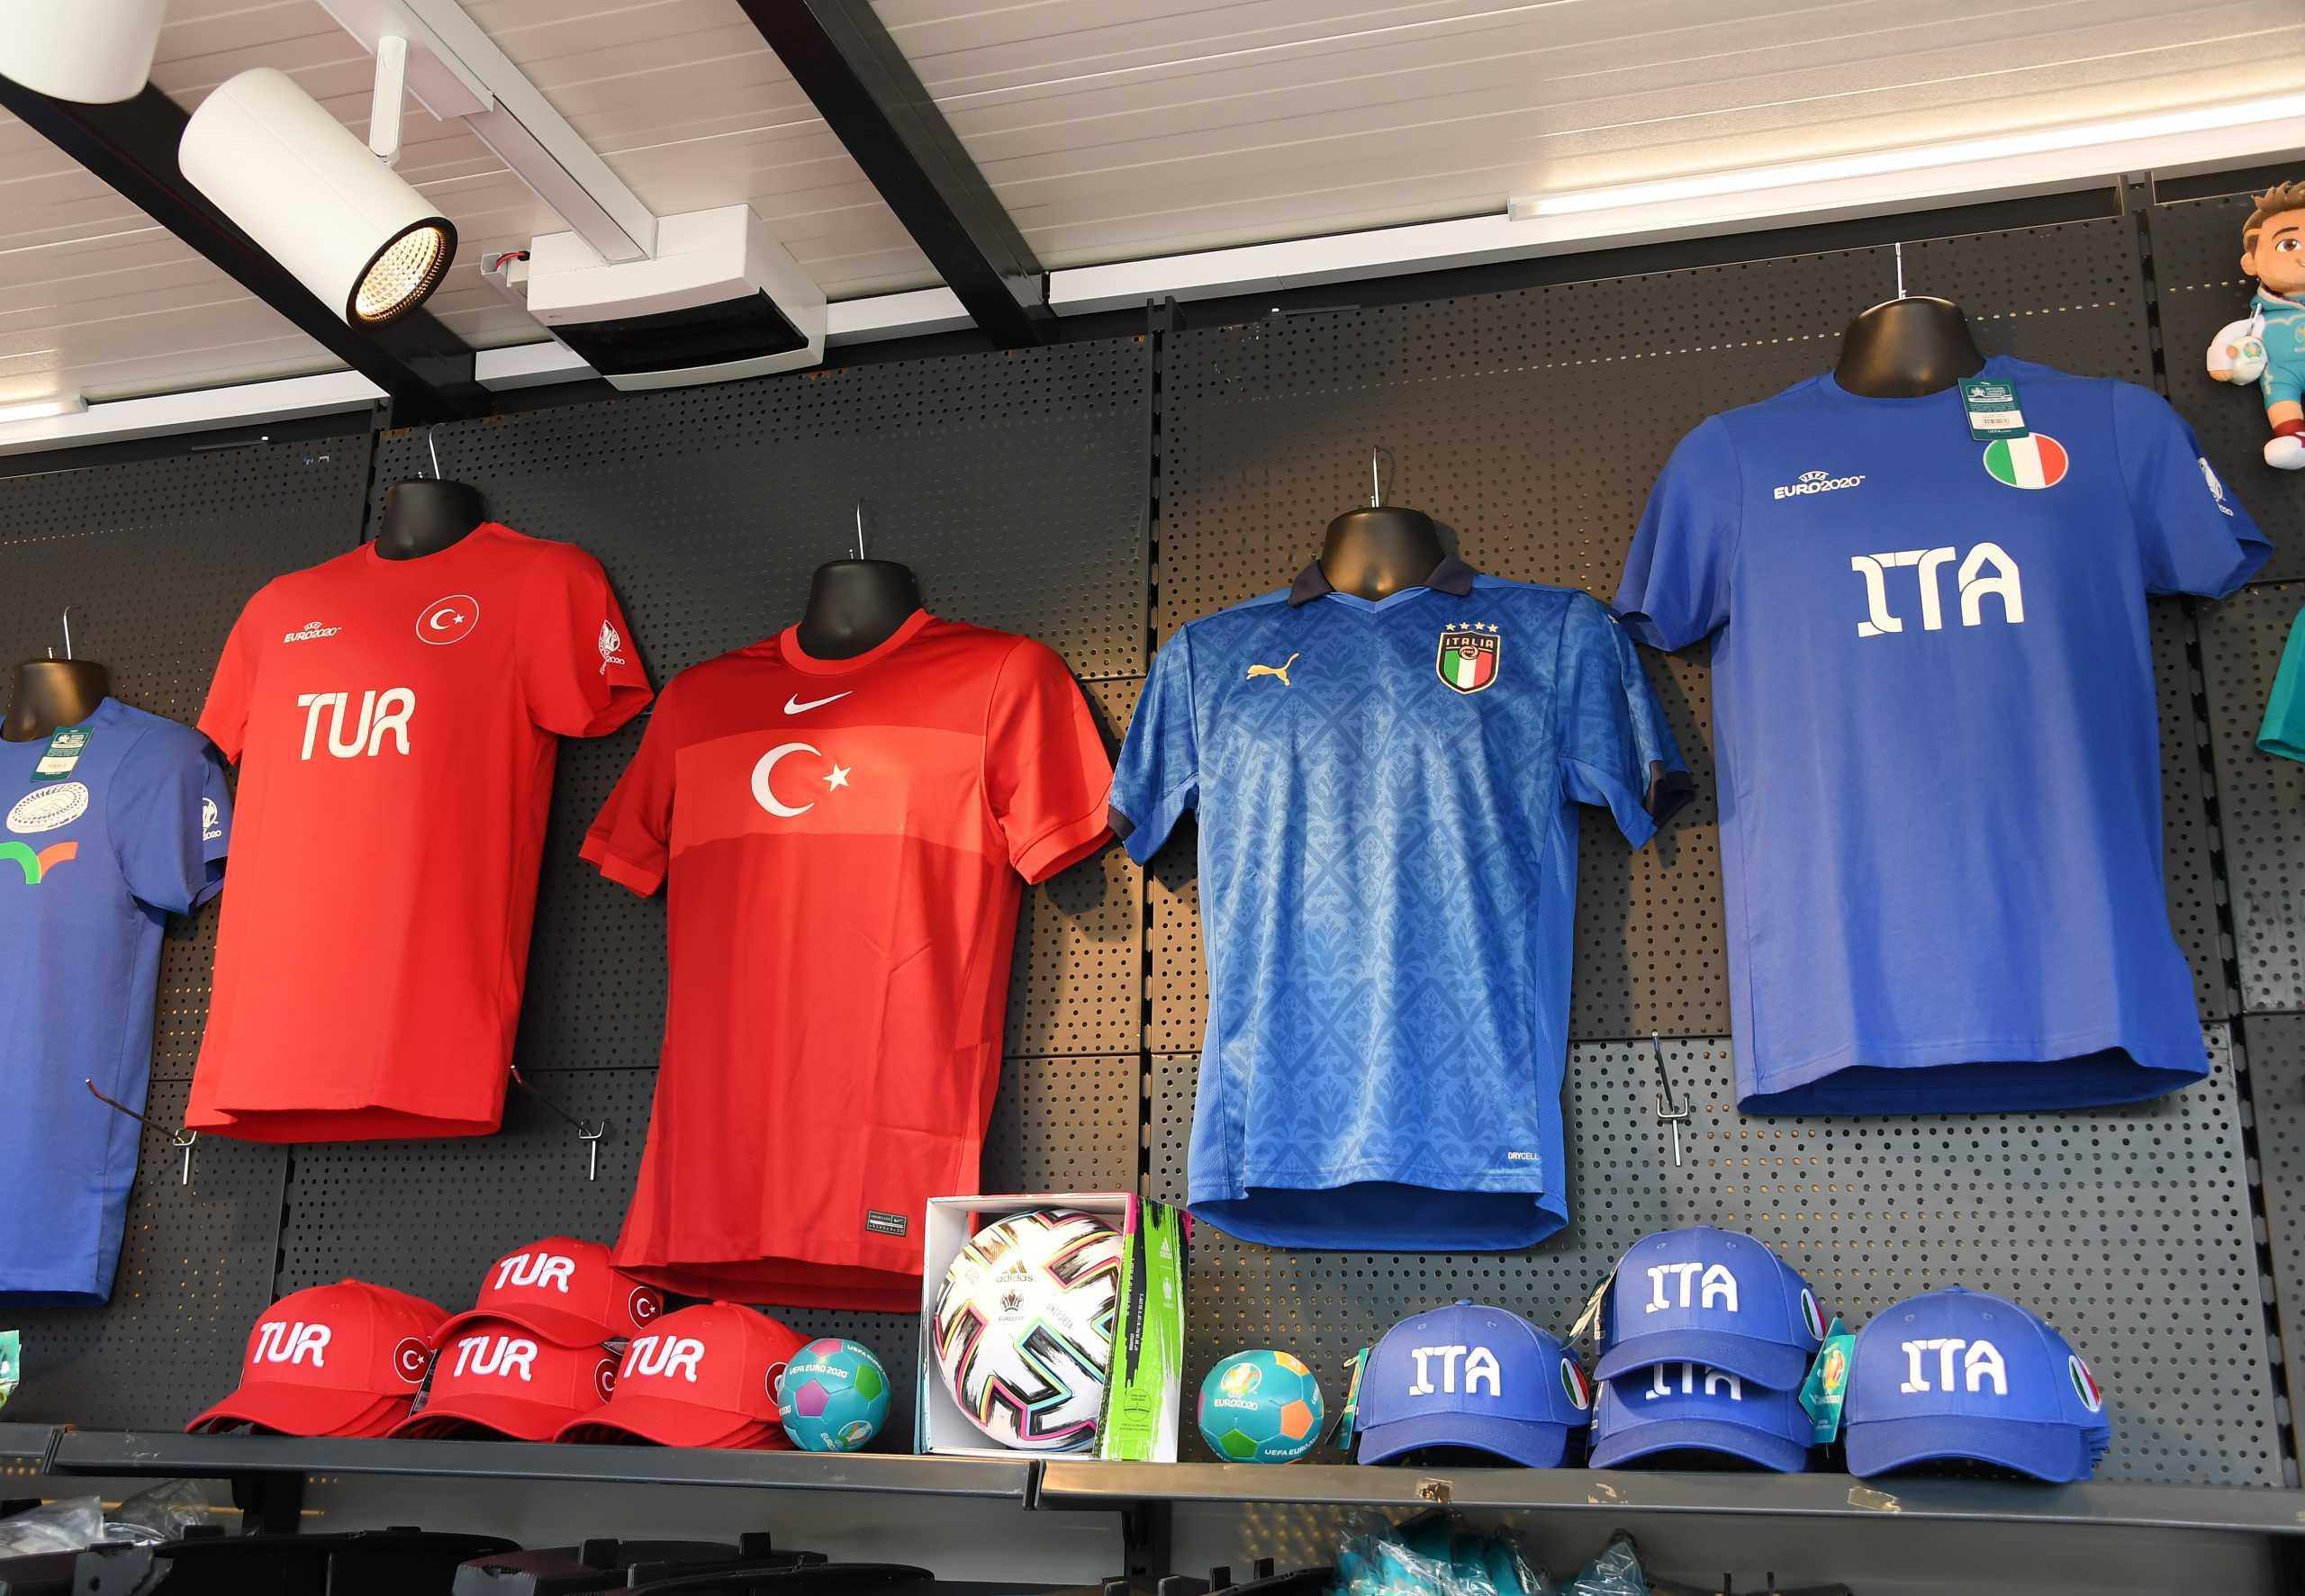 Euro 2020: Φόβοι για διπλωματικό επεισόδιο στο Ιταλία – Τουρκία και… «stop» λόγω Σένγκεν